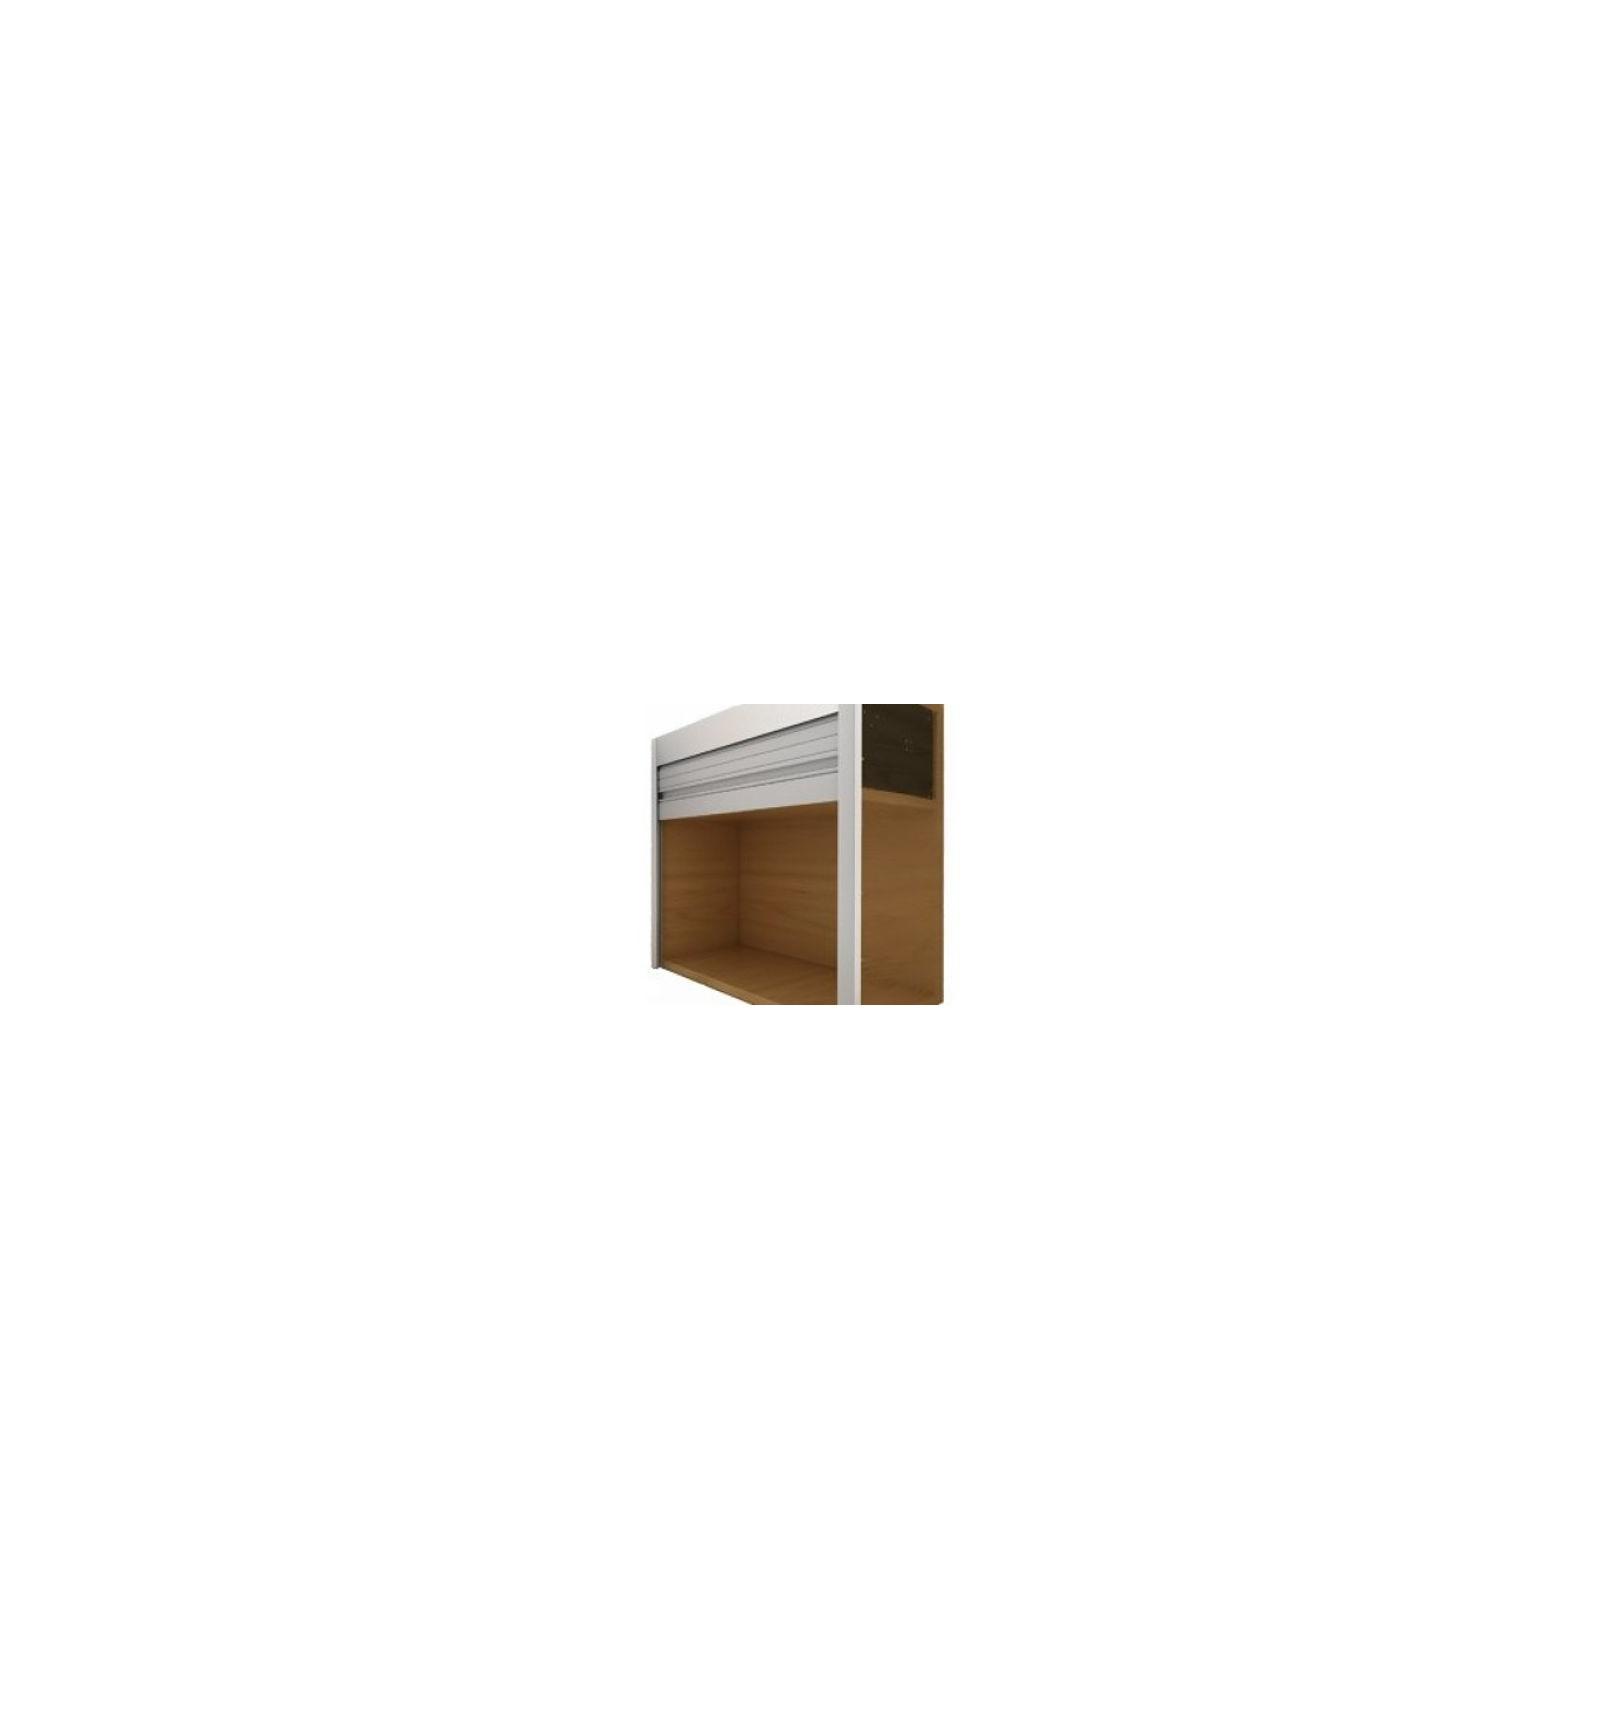 Kit persiana aluminio mueble de cocina herrajes del sureste - Herrajes del sureste ...